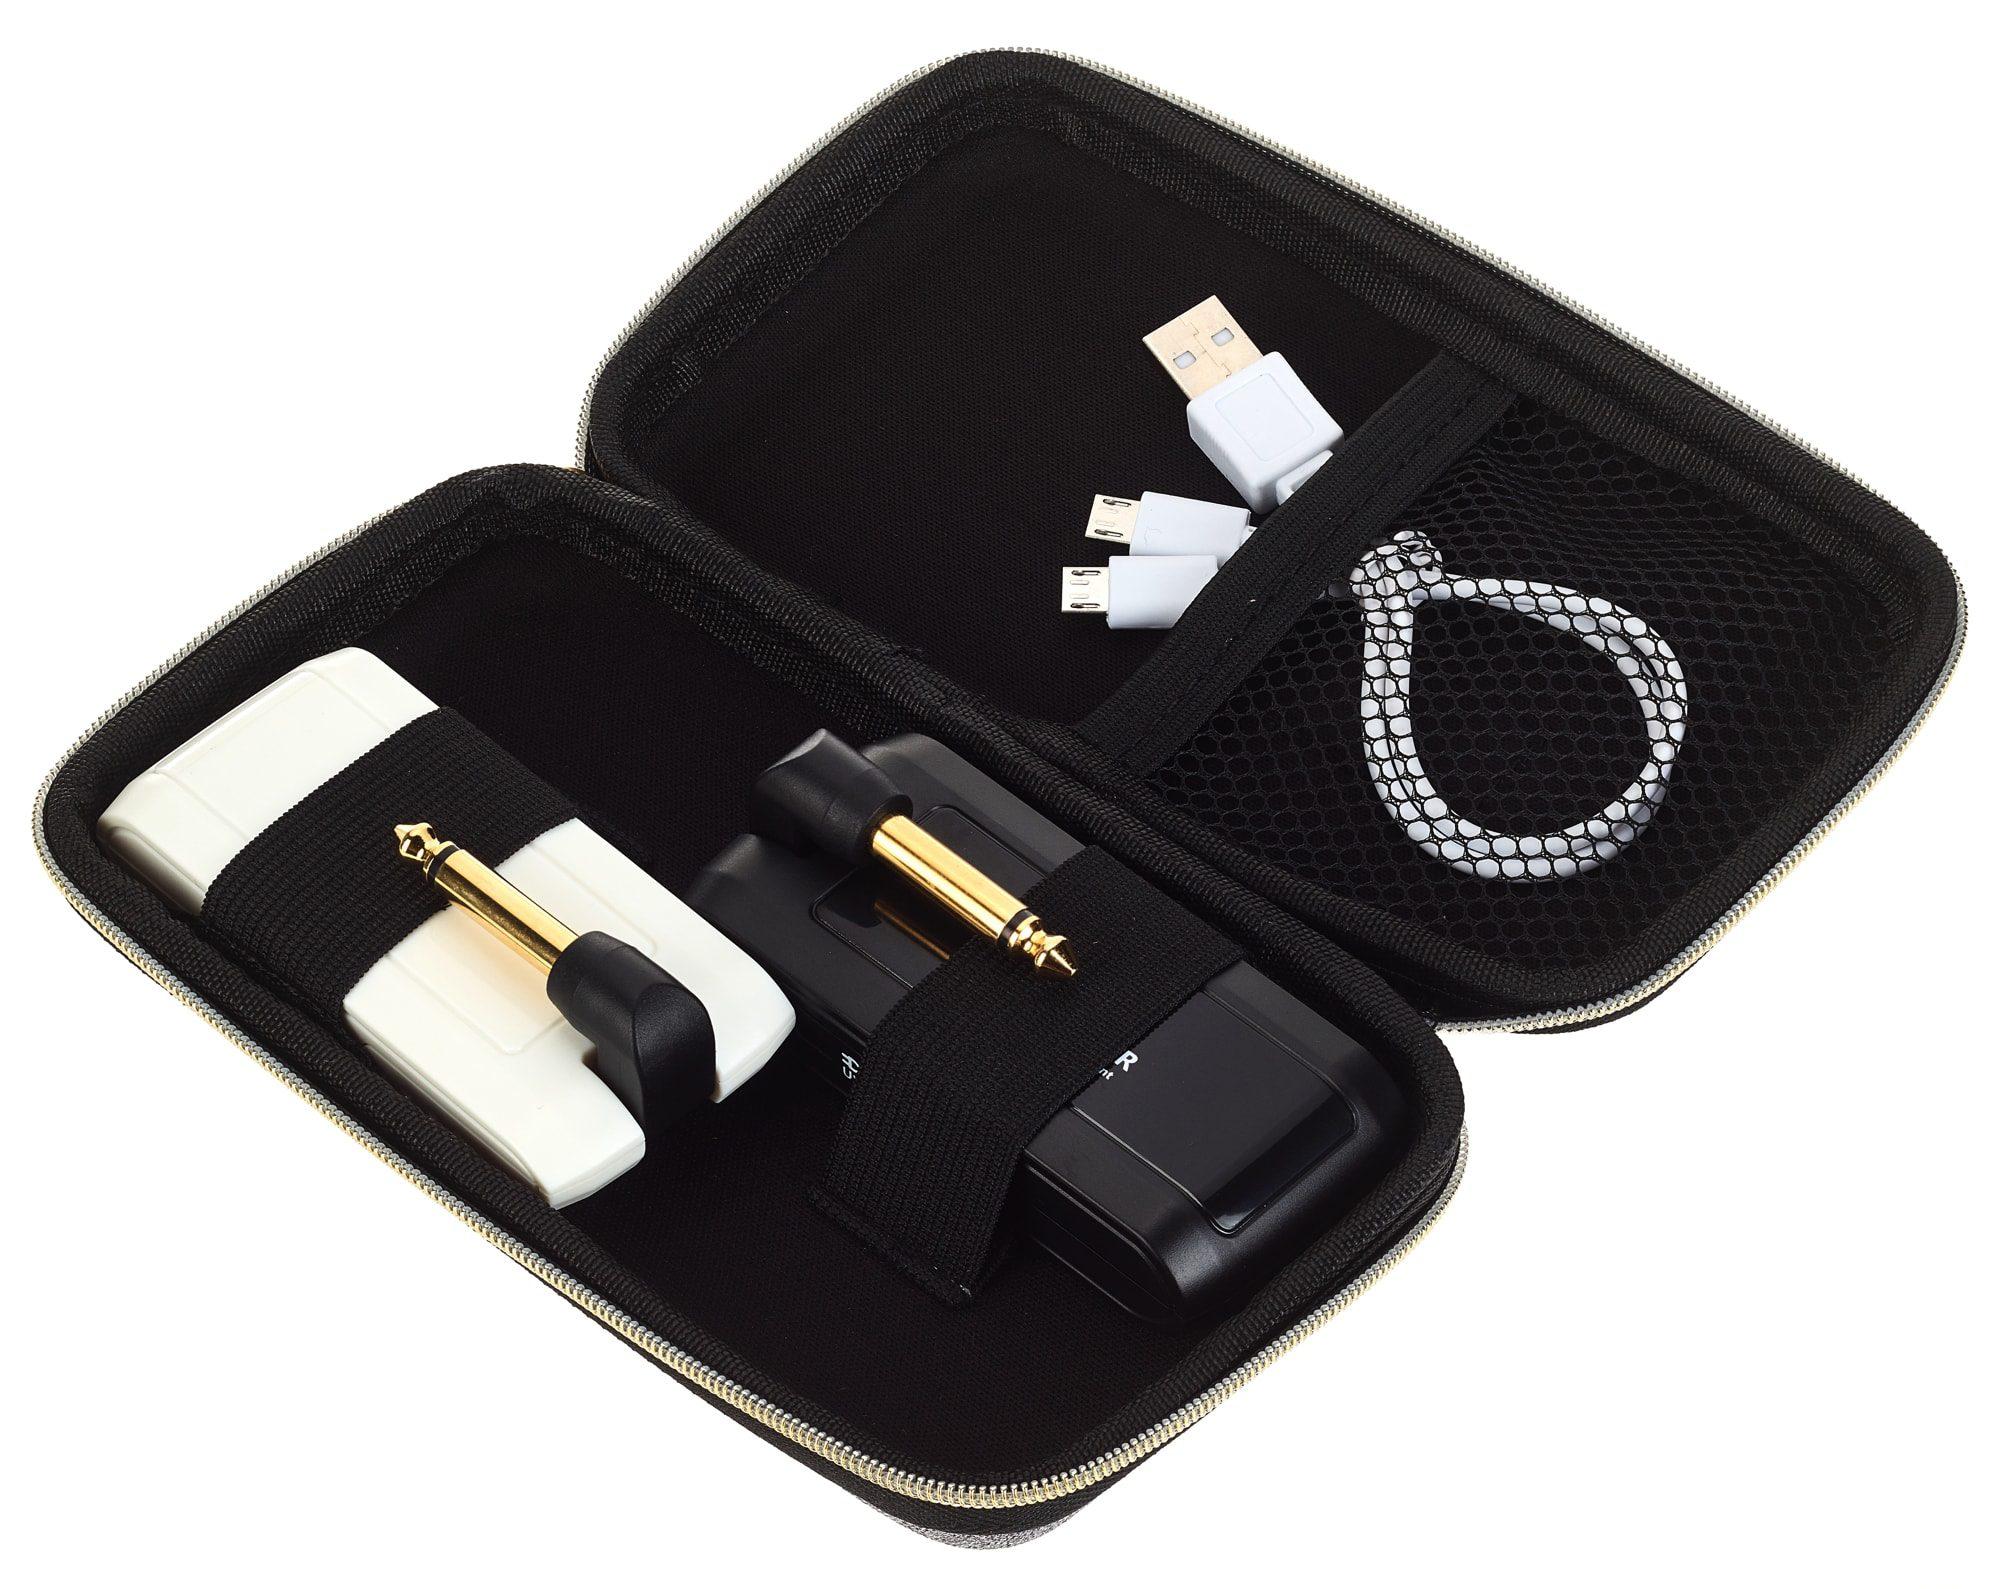 Harley Benton AirBorne 5.8 GHz Instrument comes in a handy travel case